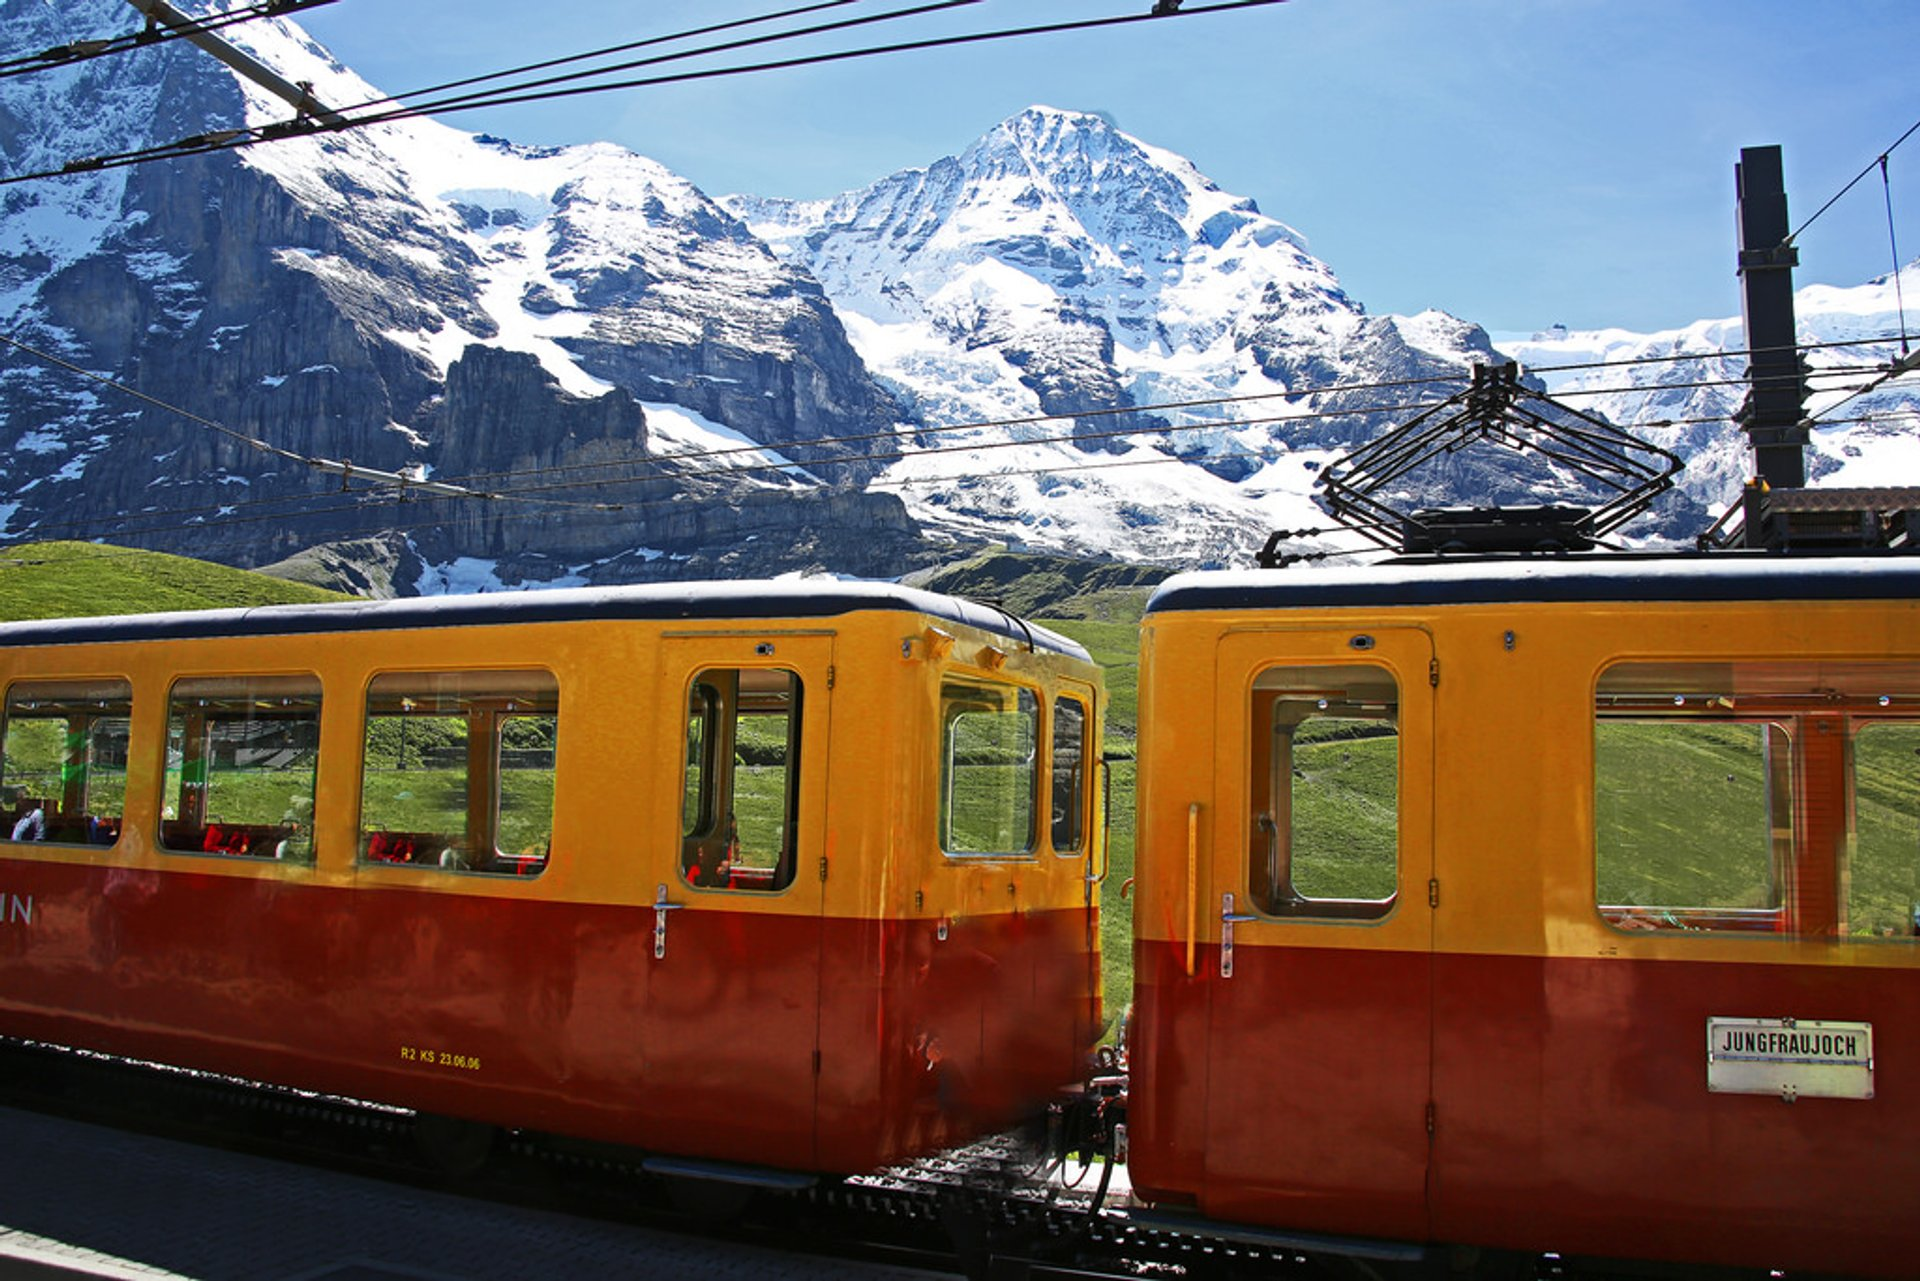 Jungfraujoch Railway 2020